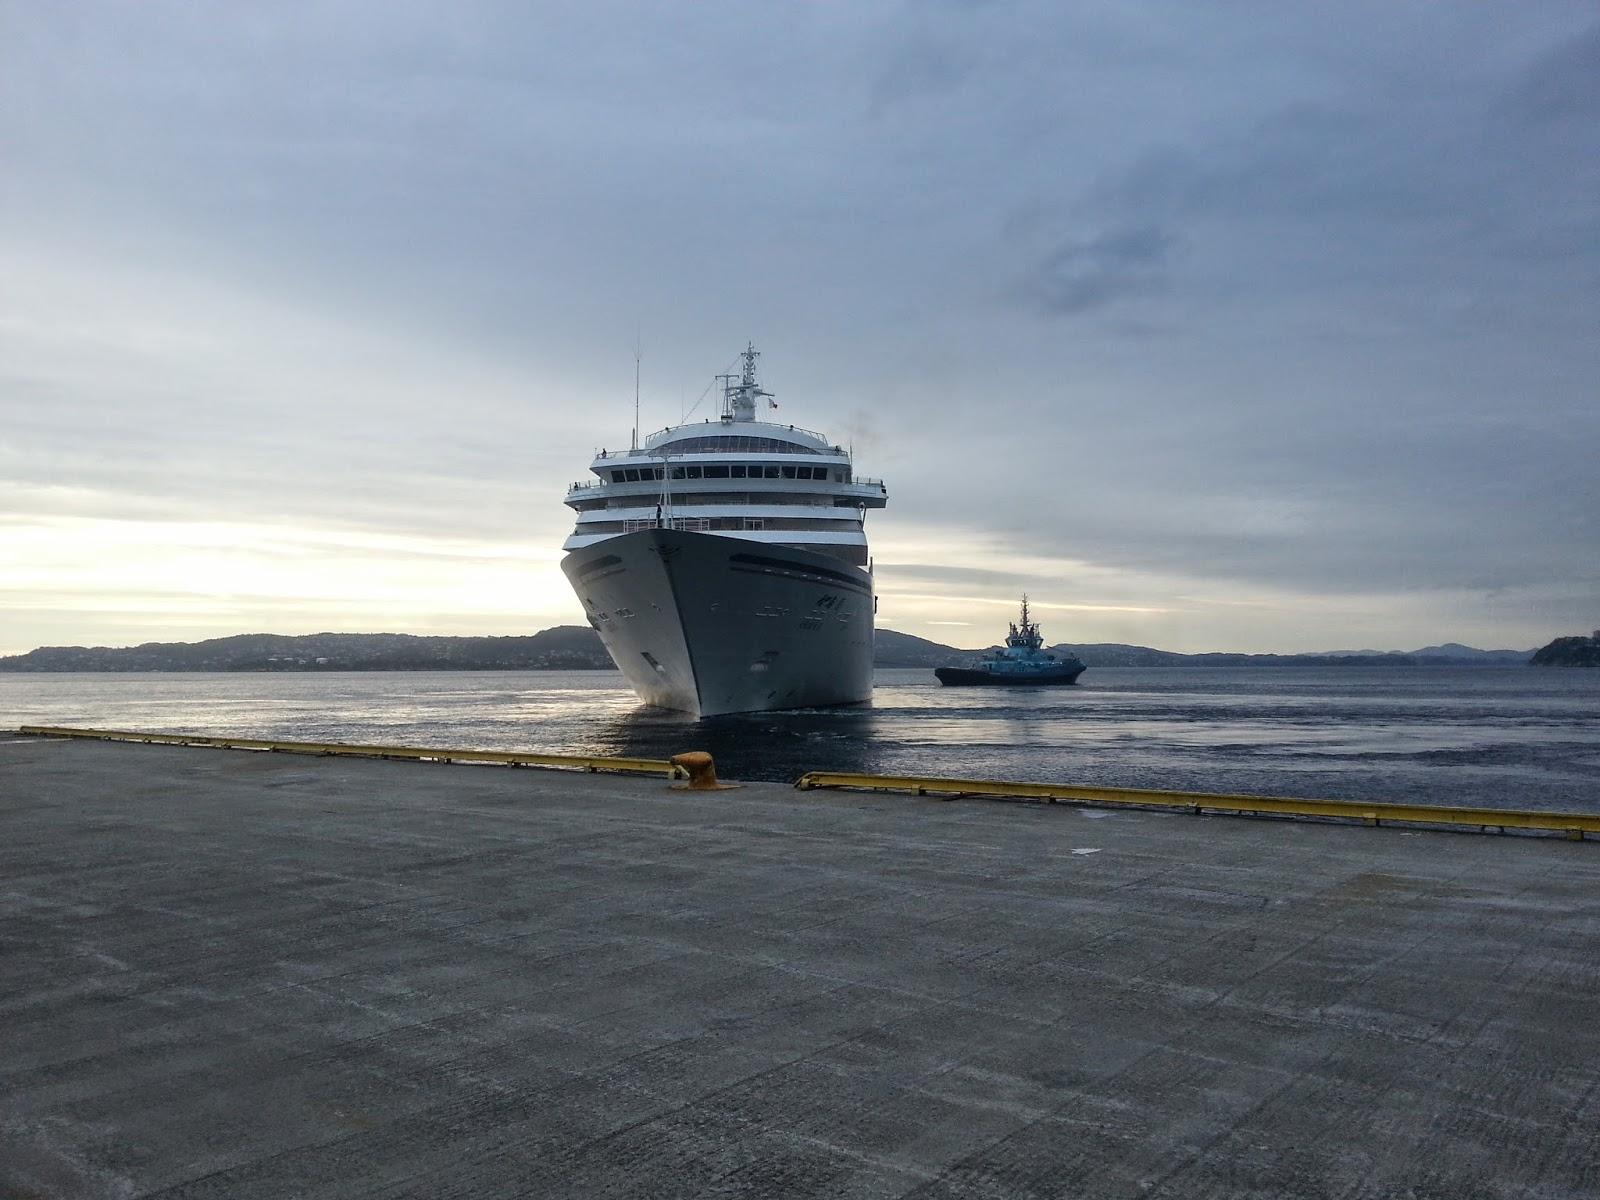 Japanese Cruise Ship Asuka II in Bergen, Norway